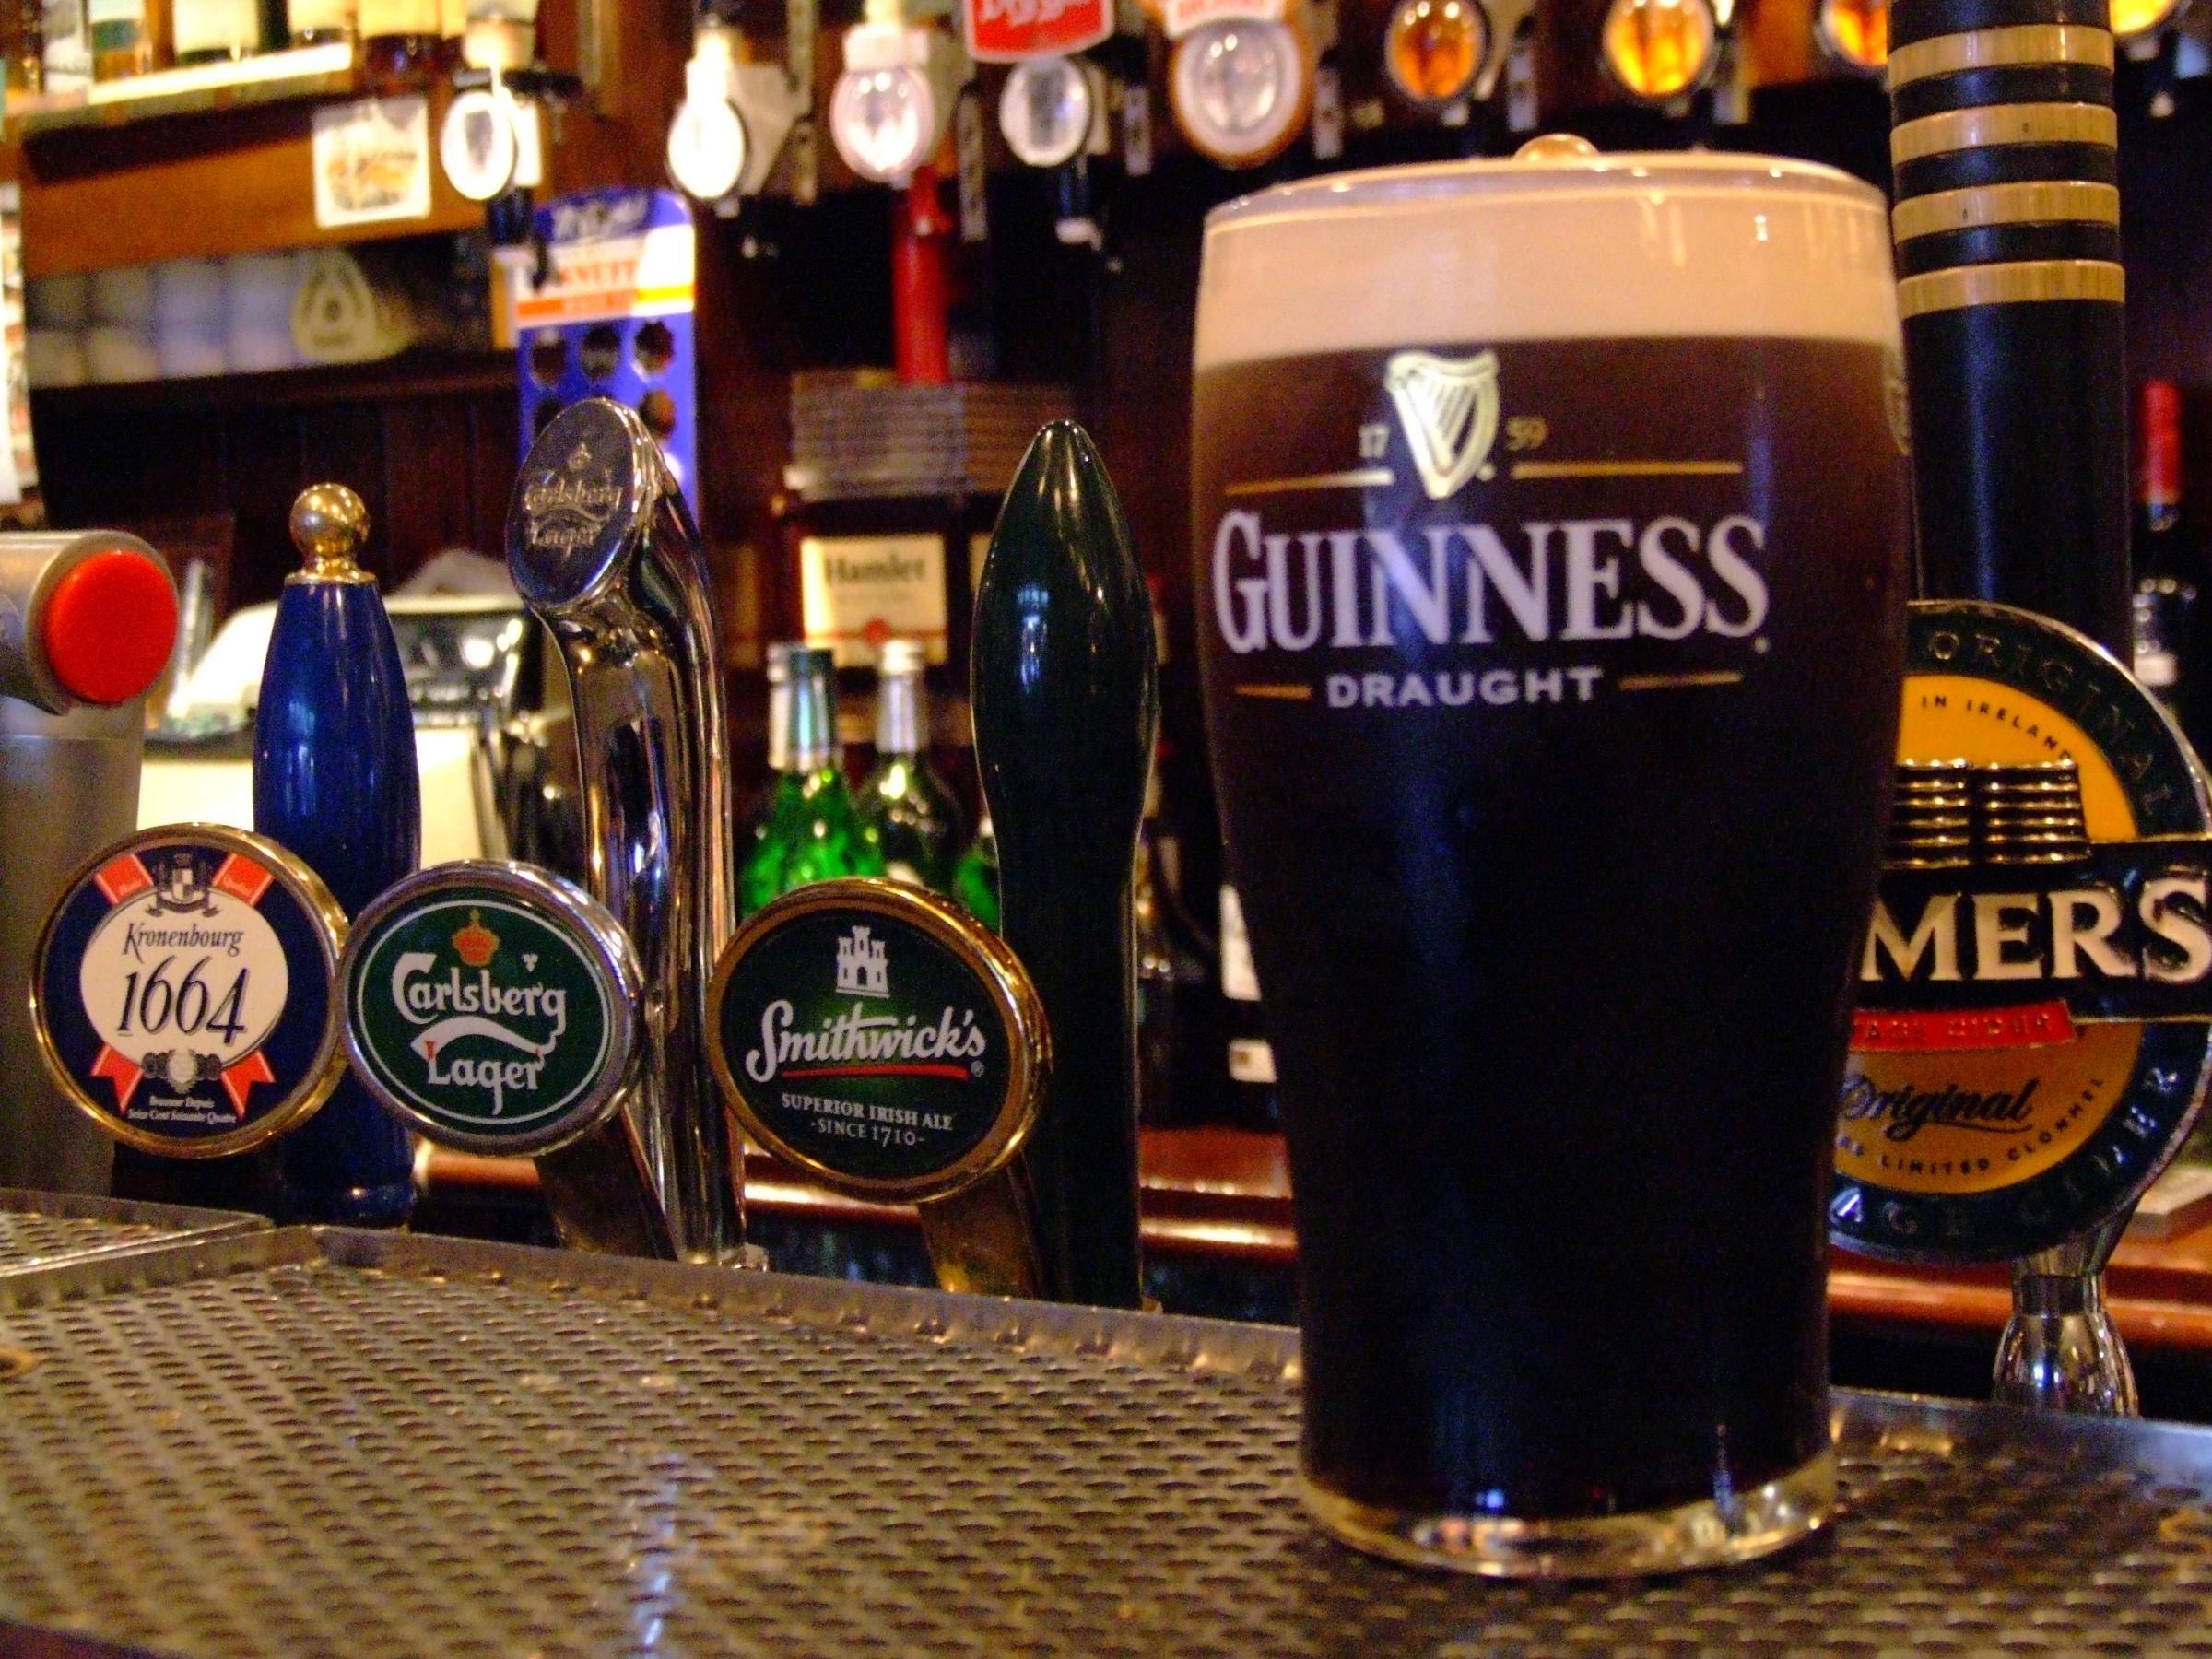 Beer Drinkers Destination, Dublin, Ireland, Guinness beer pint